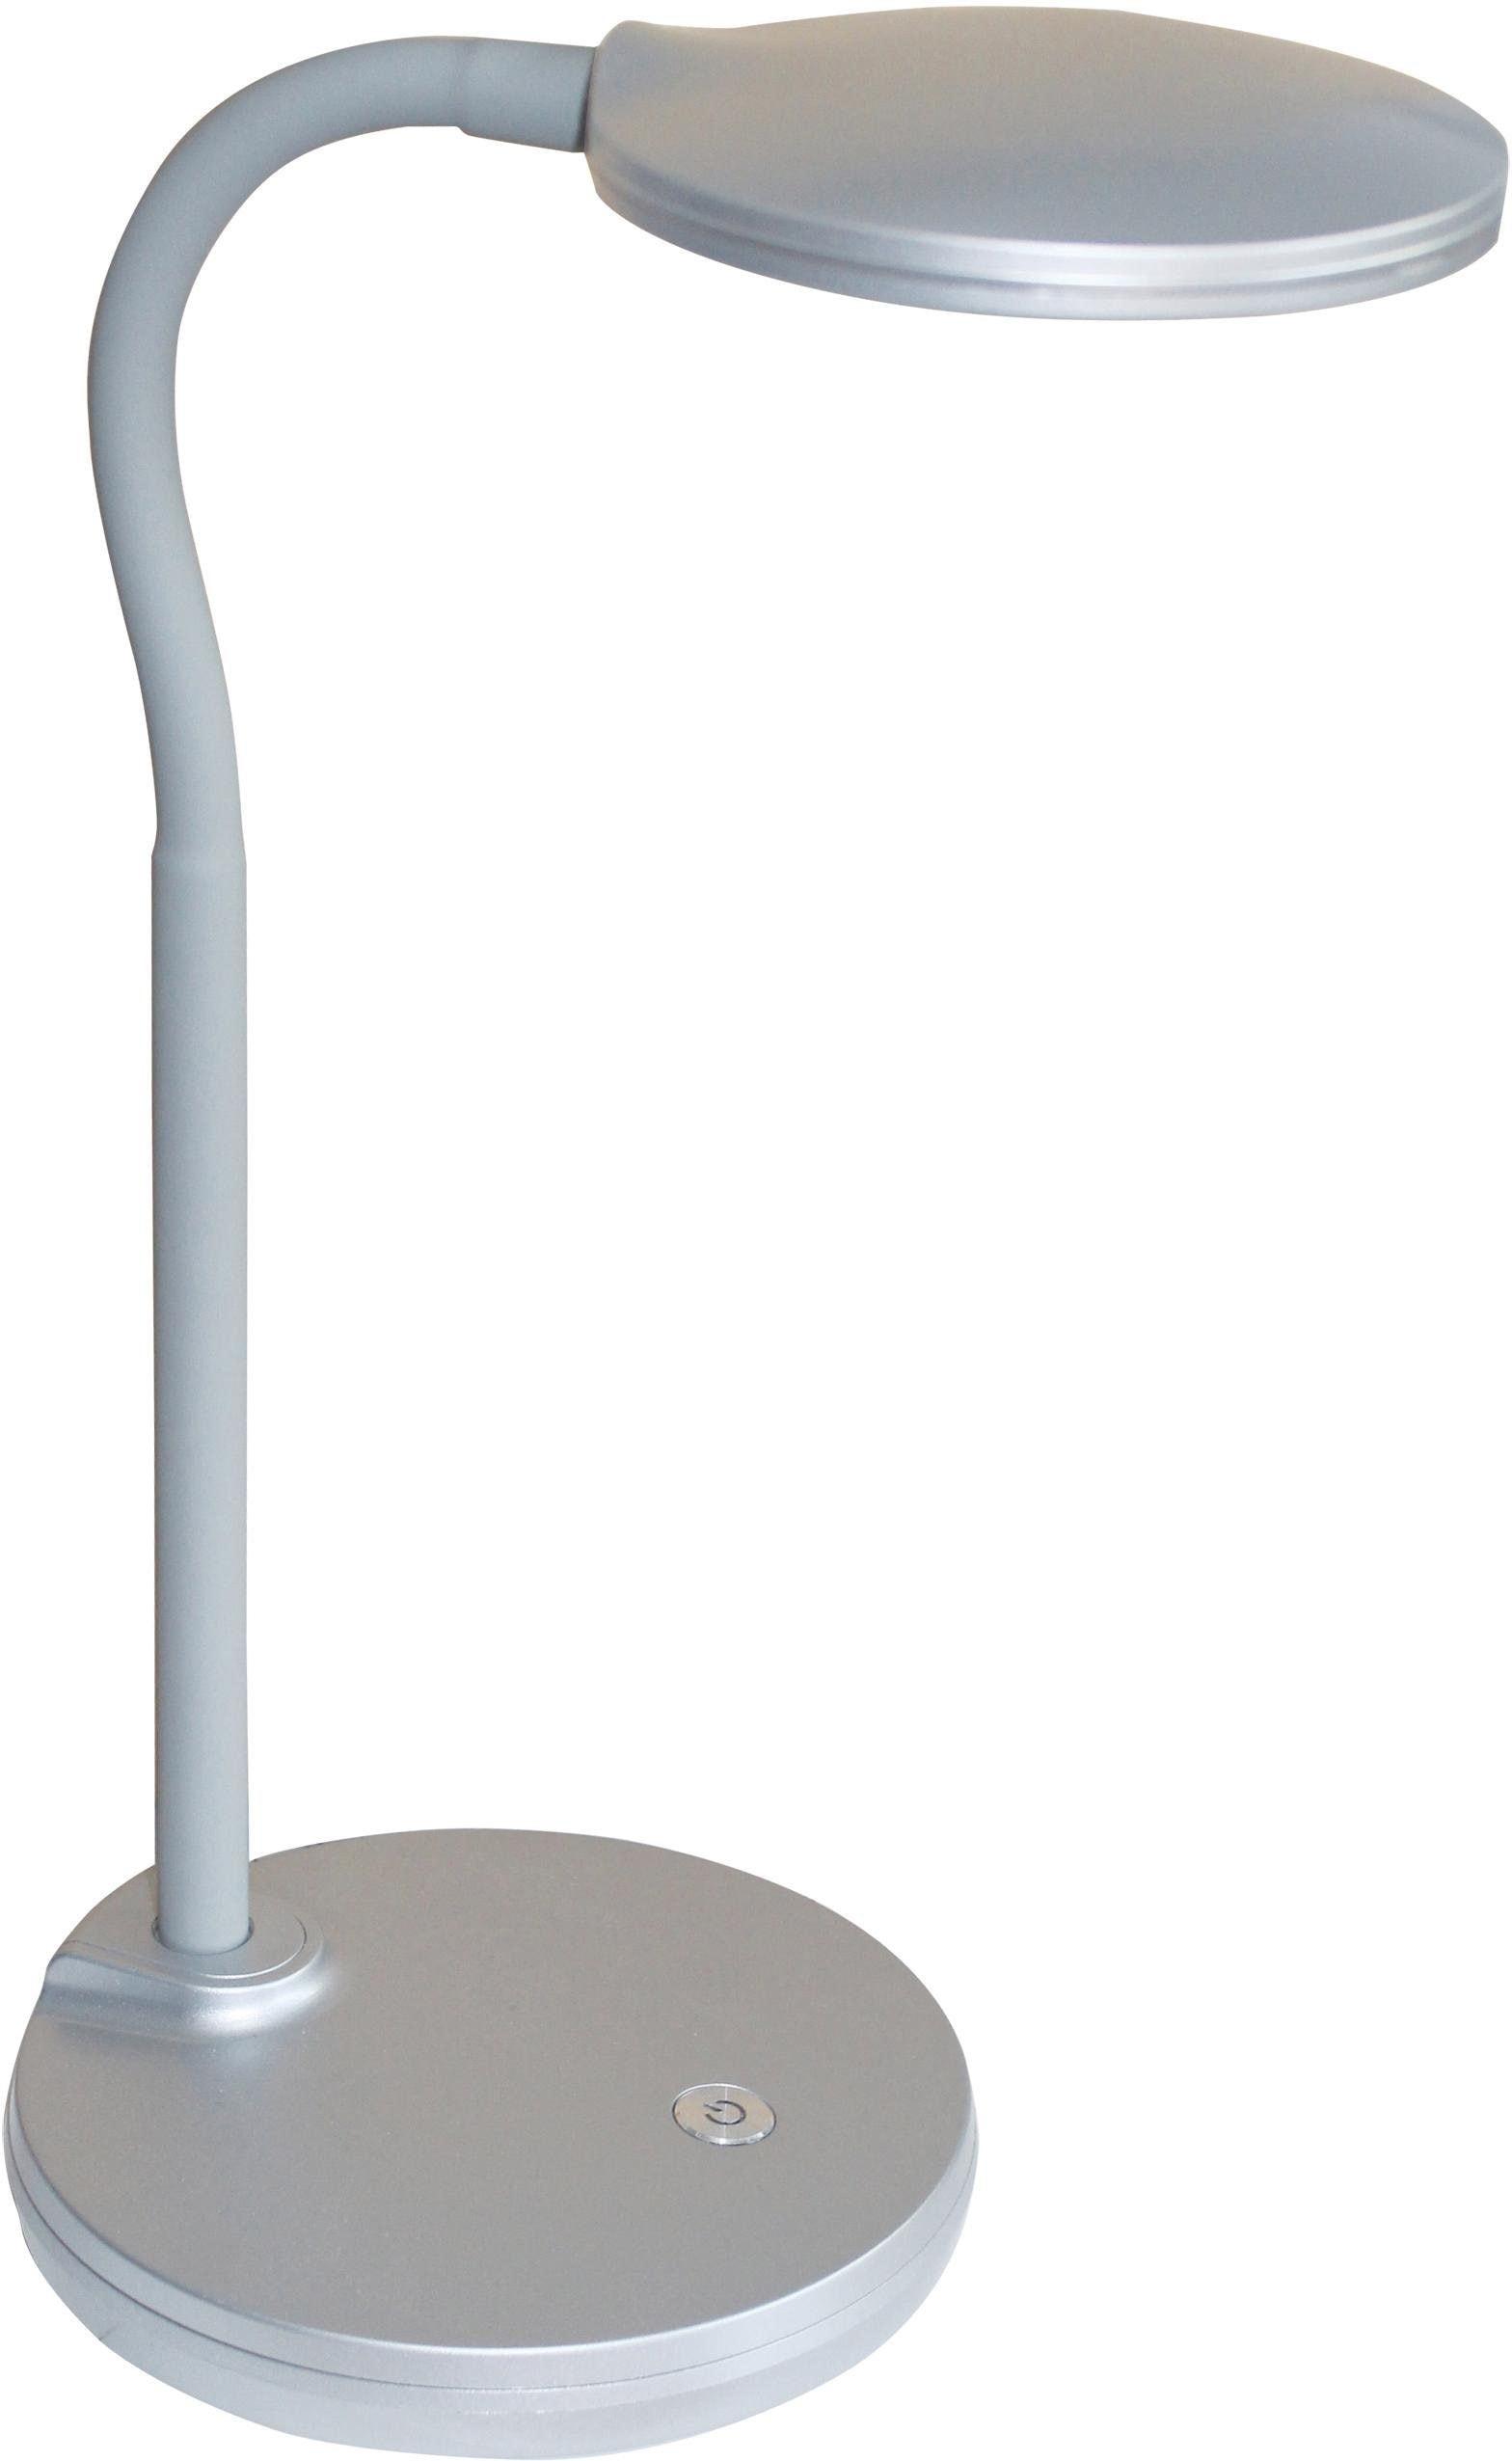 Nino Leuchten,LED Tischleuchte Carmen